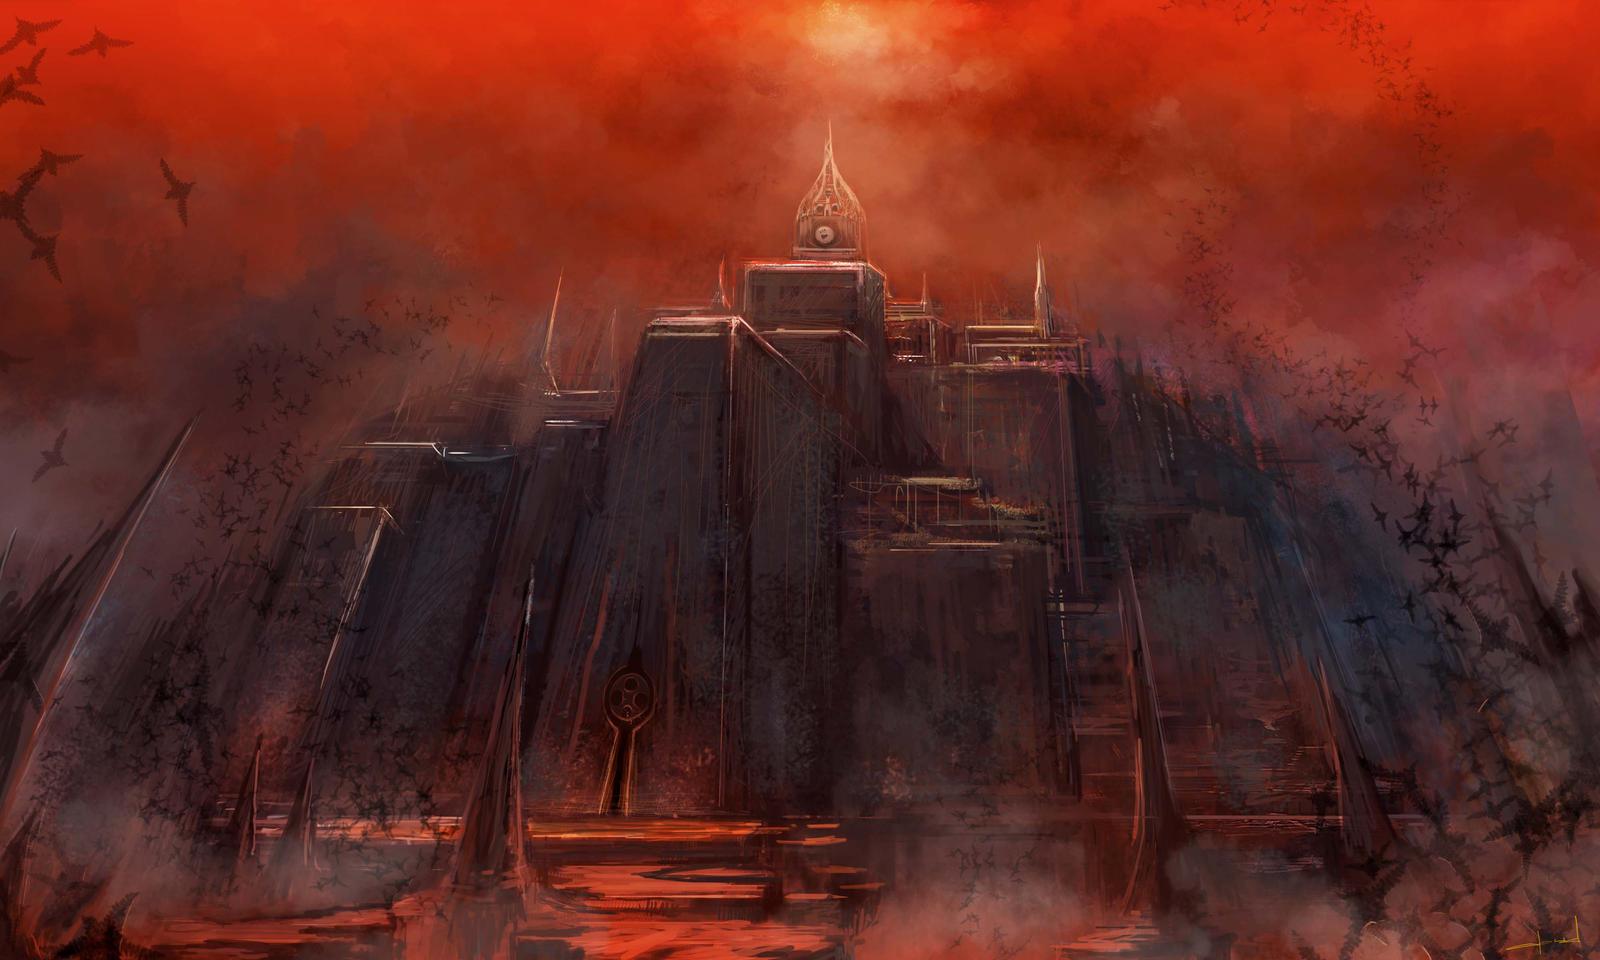 Altar of sacrifice by Darkcloud013